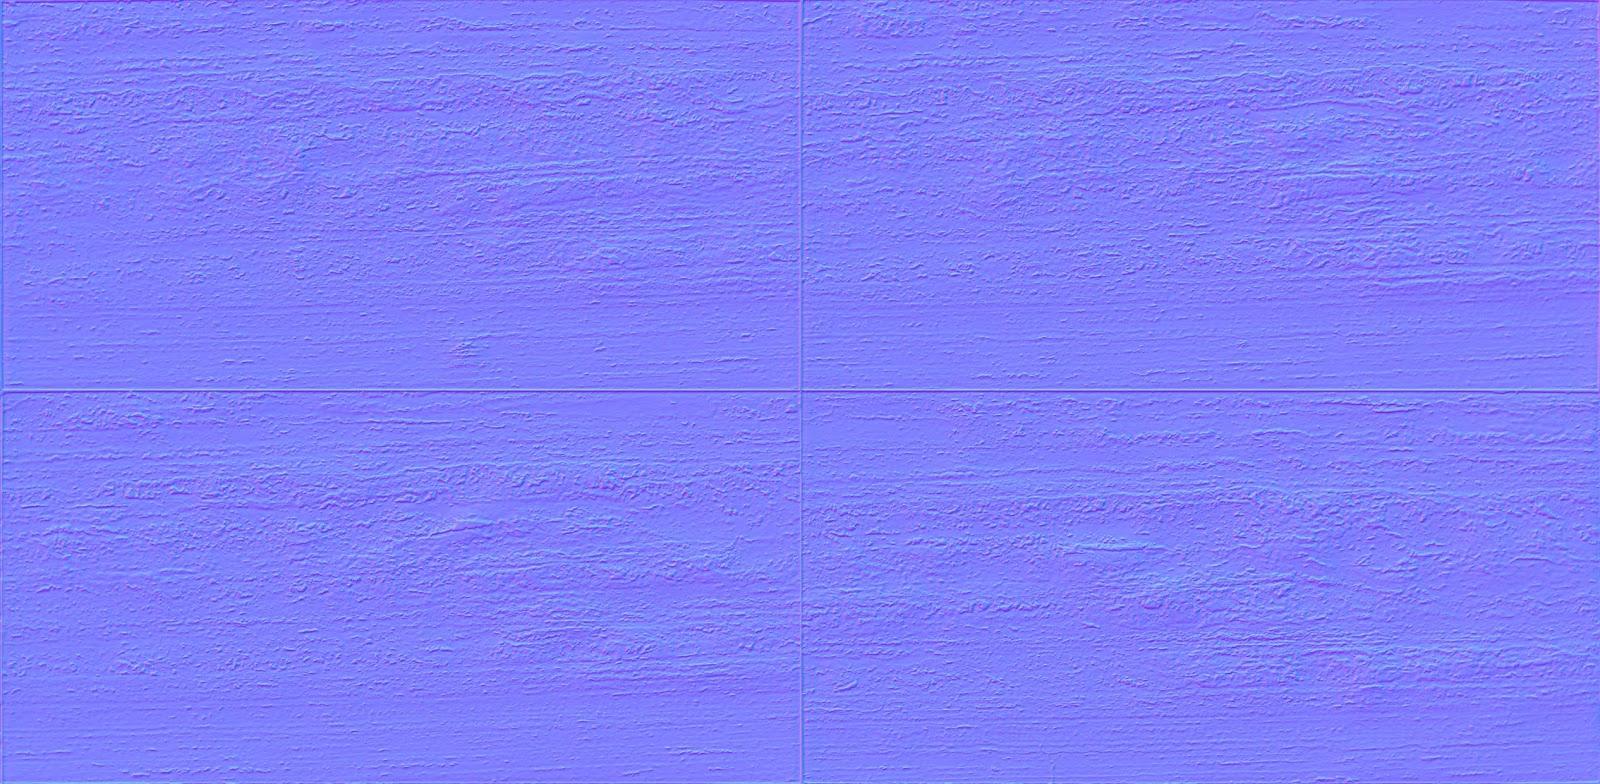 Texturise Free Seamless Textures With Maps: Limestone Big